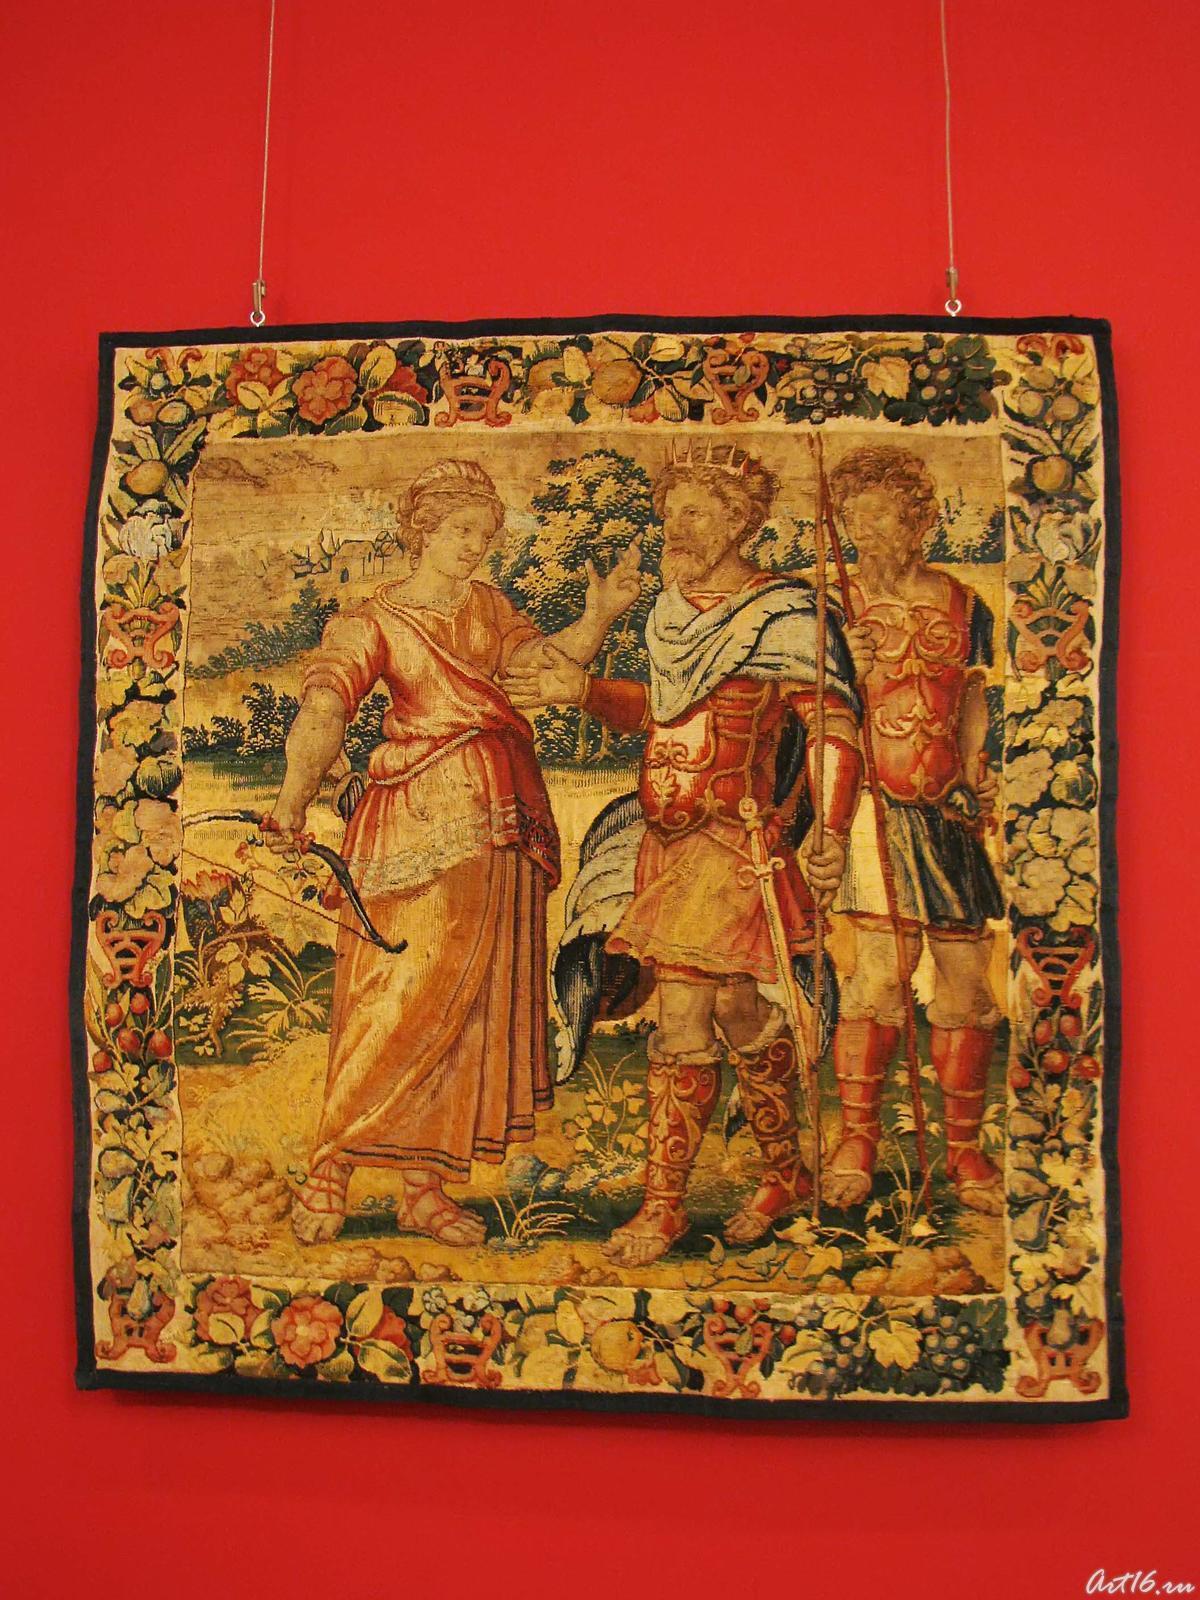 Фото №35609. Шпалера: Одиссей и Калипсо (Мелеагр и Атланта?)